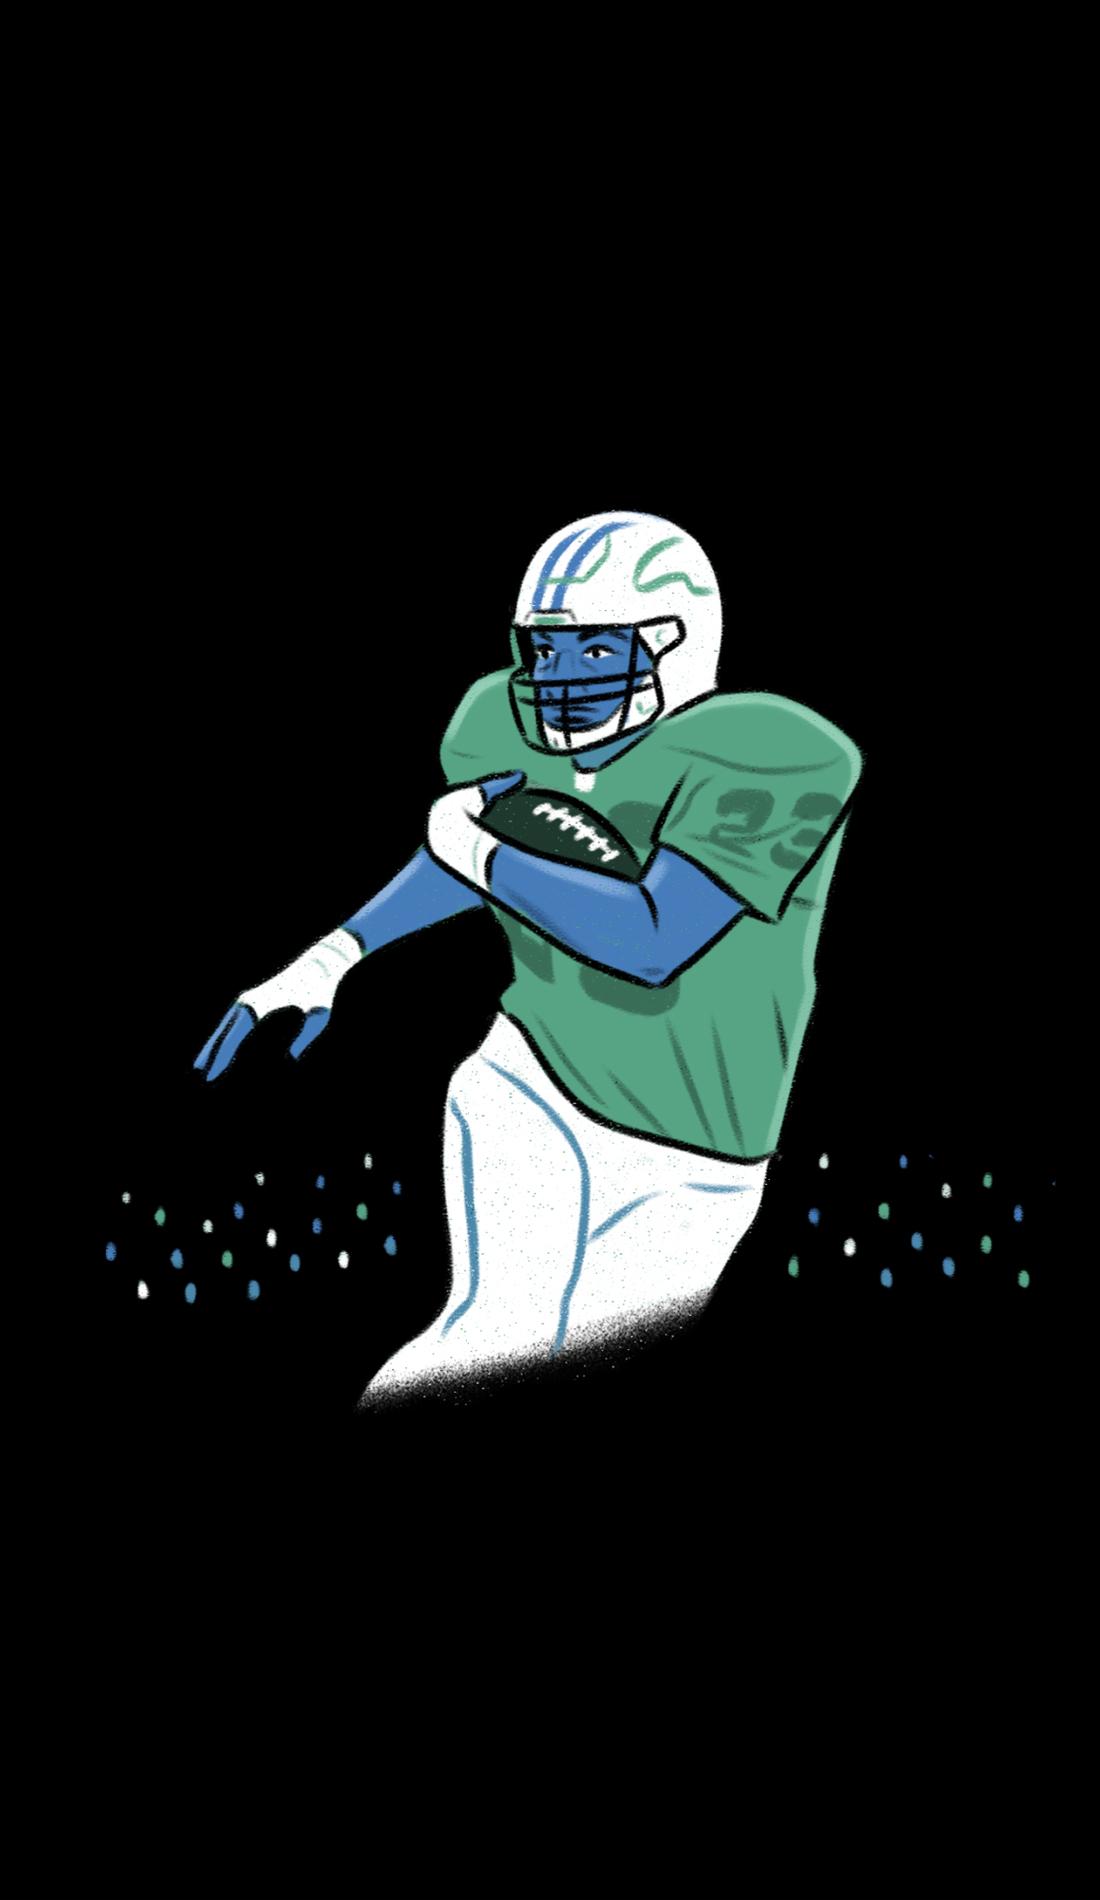 A Louisiana-Monroe Warhawks Football live event